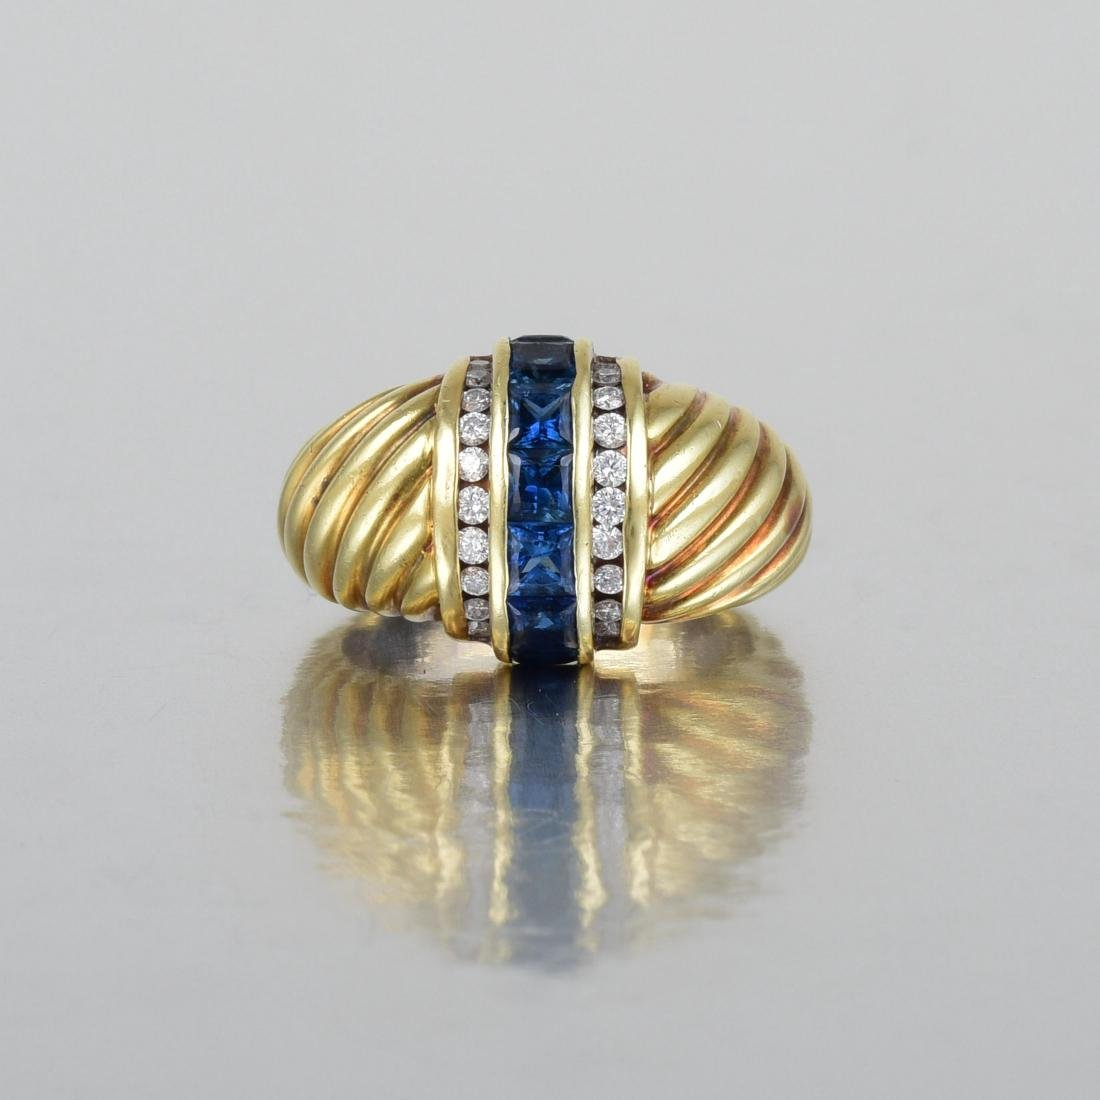 David Yurman Diamond and Sapphire Ring - 2